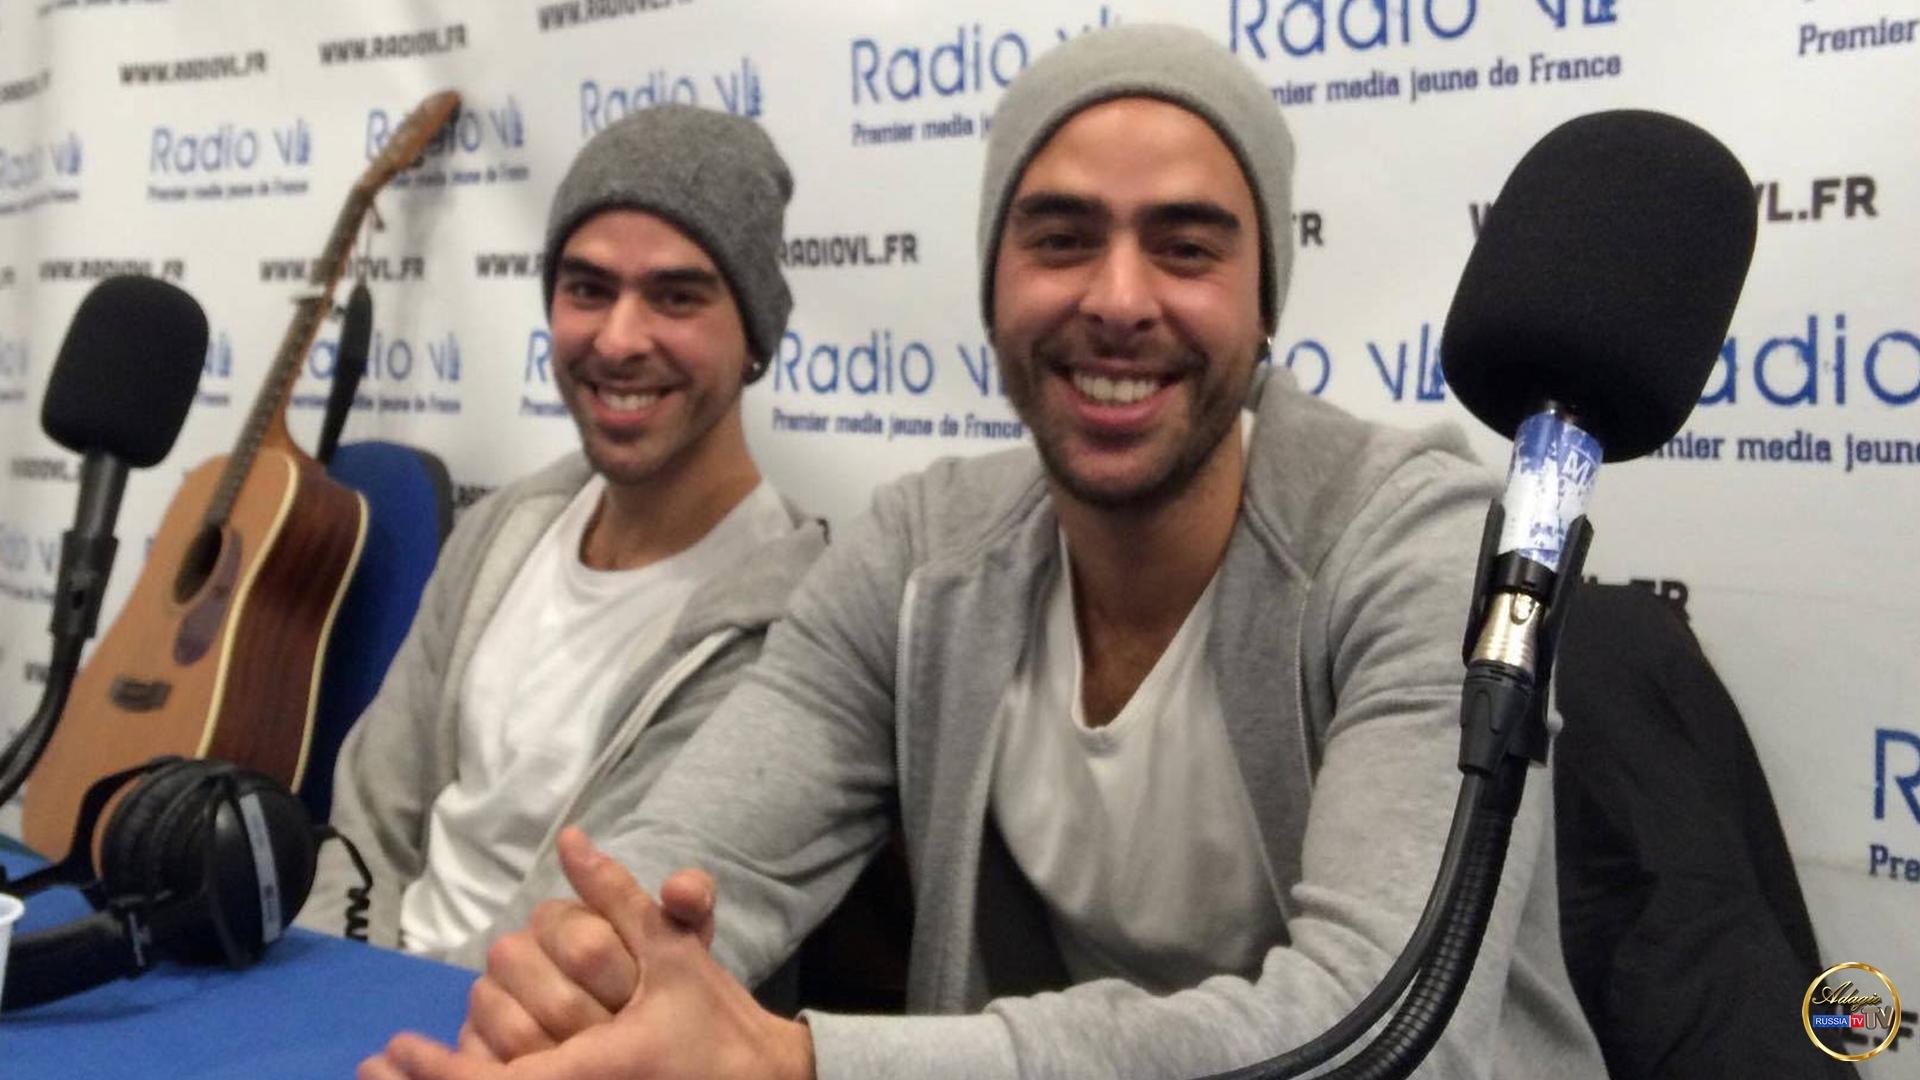 twins-phoenix-adagio-tv-russia-news